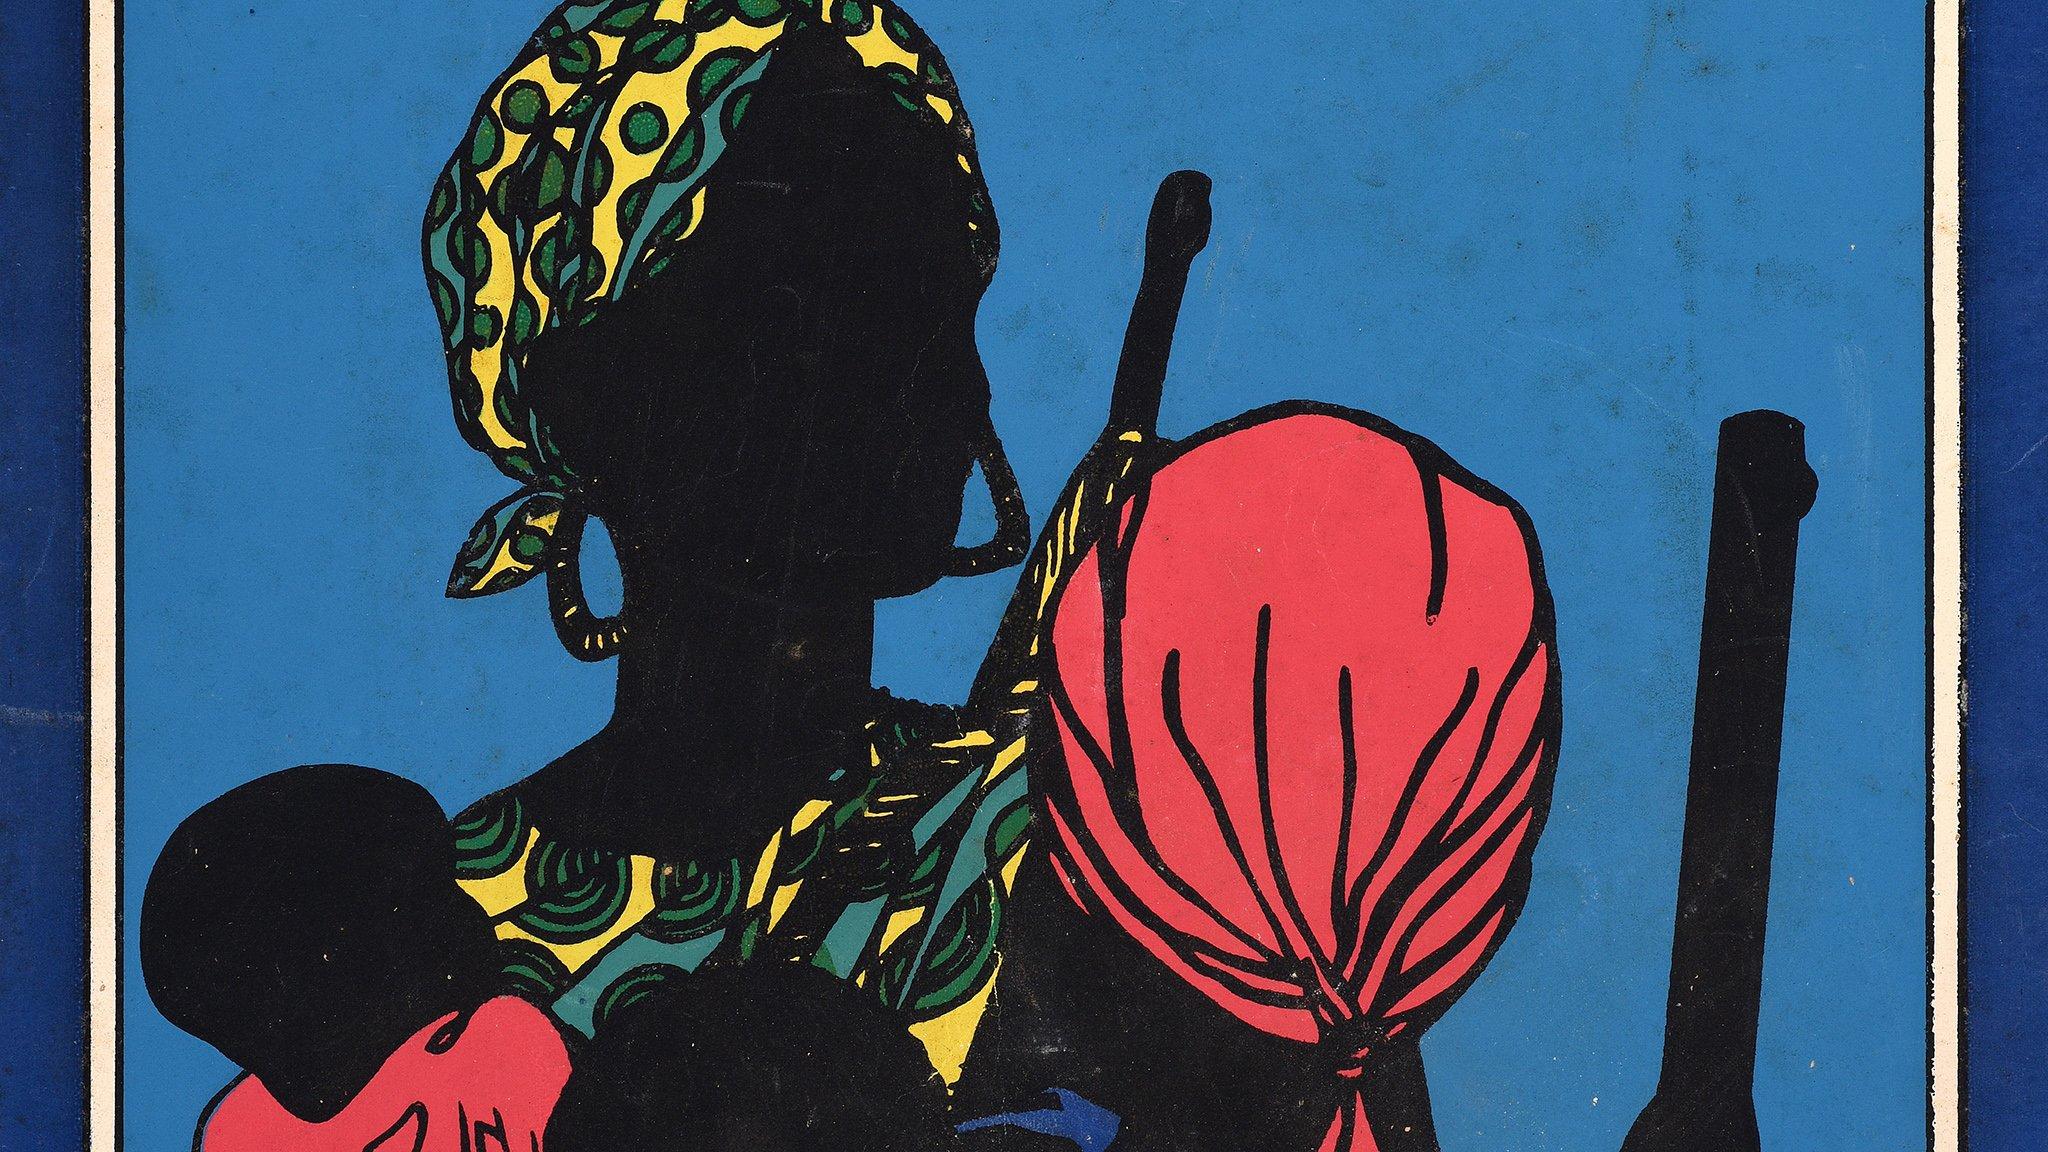 Cuban propaganda celebrating revolutionary African women